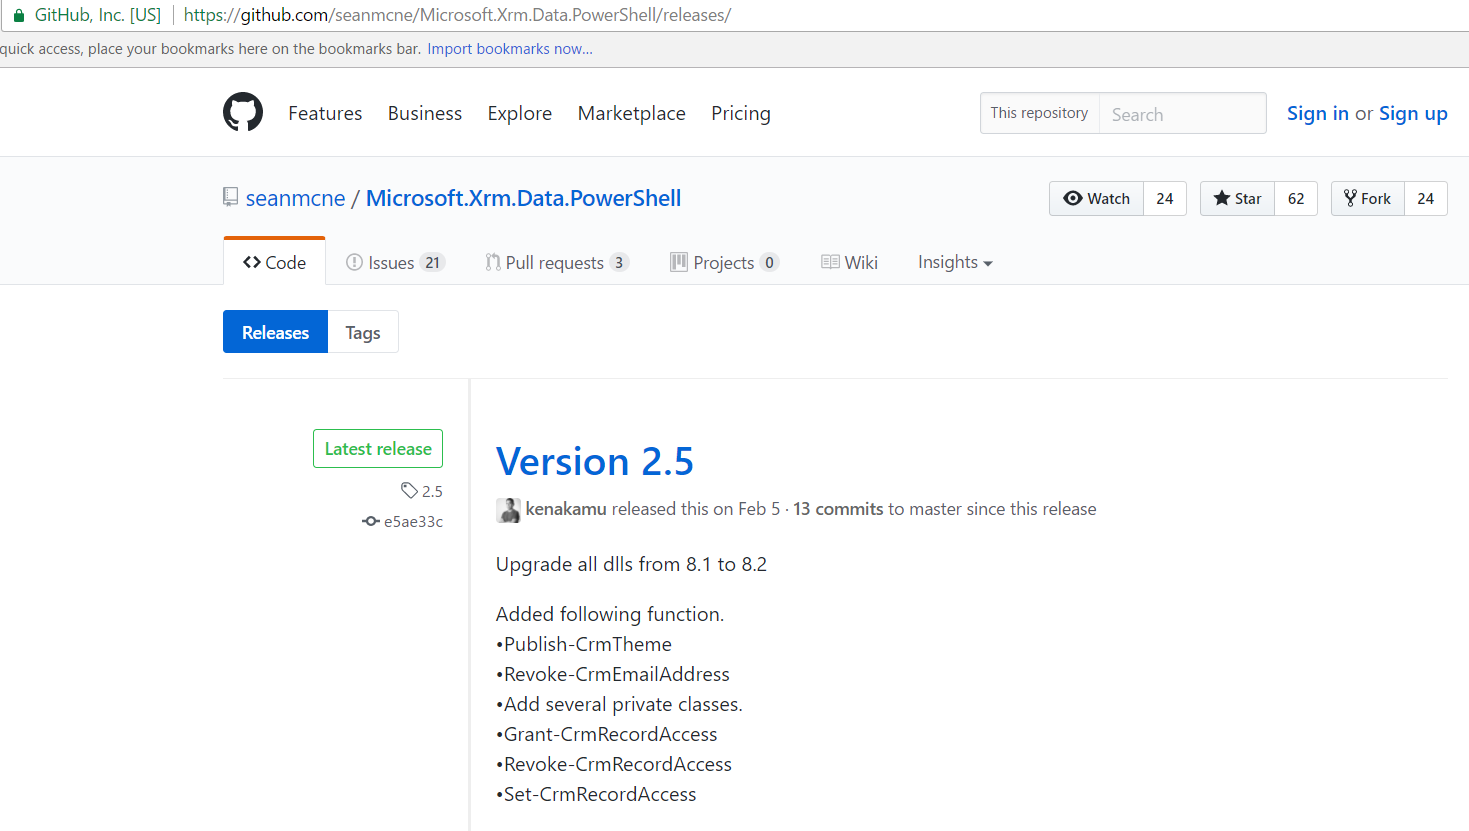 Dynamics 365 PowerShell - Microsoft Xrm Data Powershell